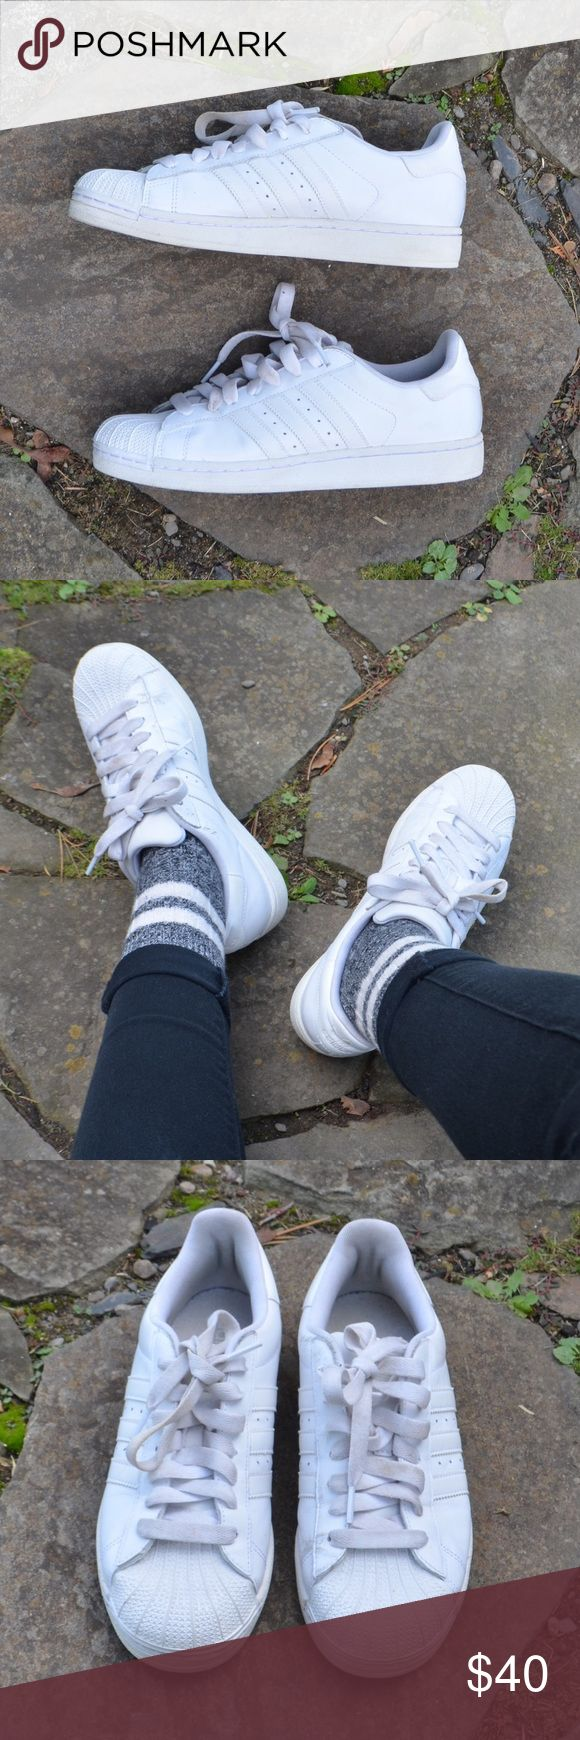 White Adidas Shell Toe Sneakers